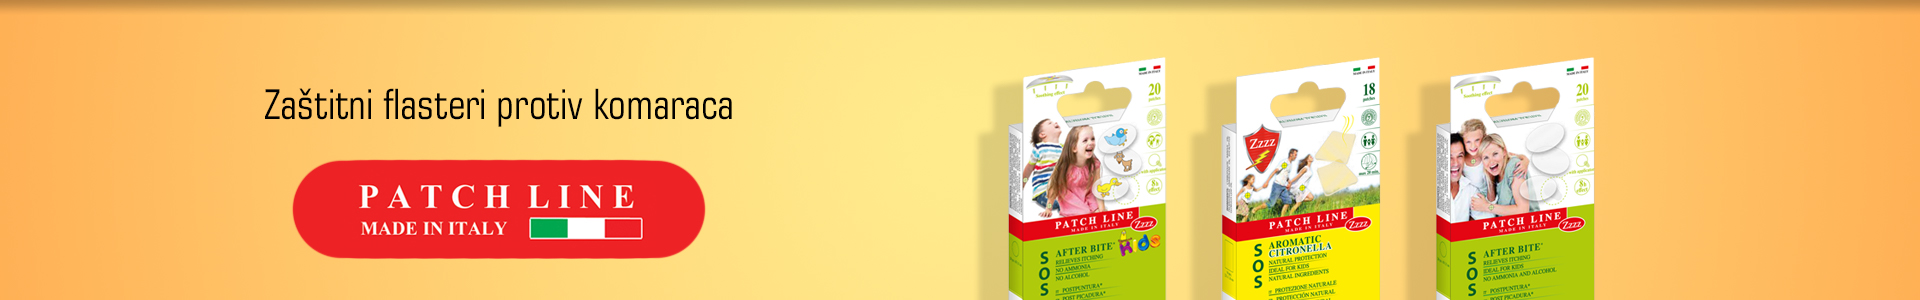 Patch line